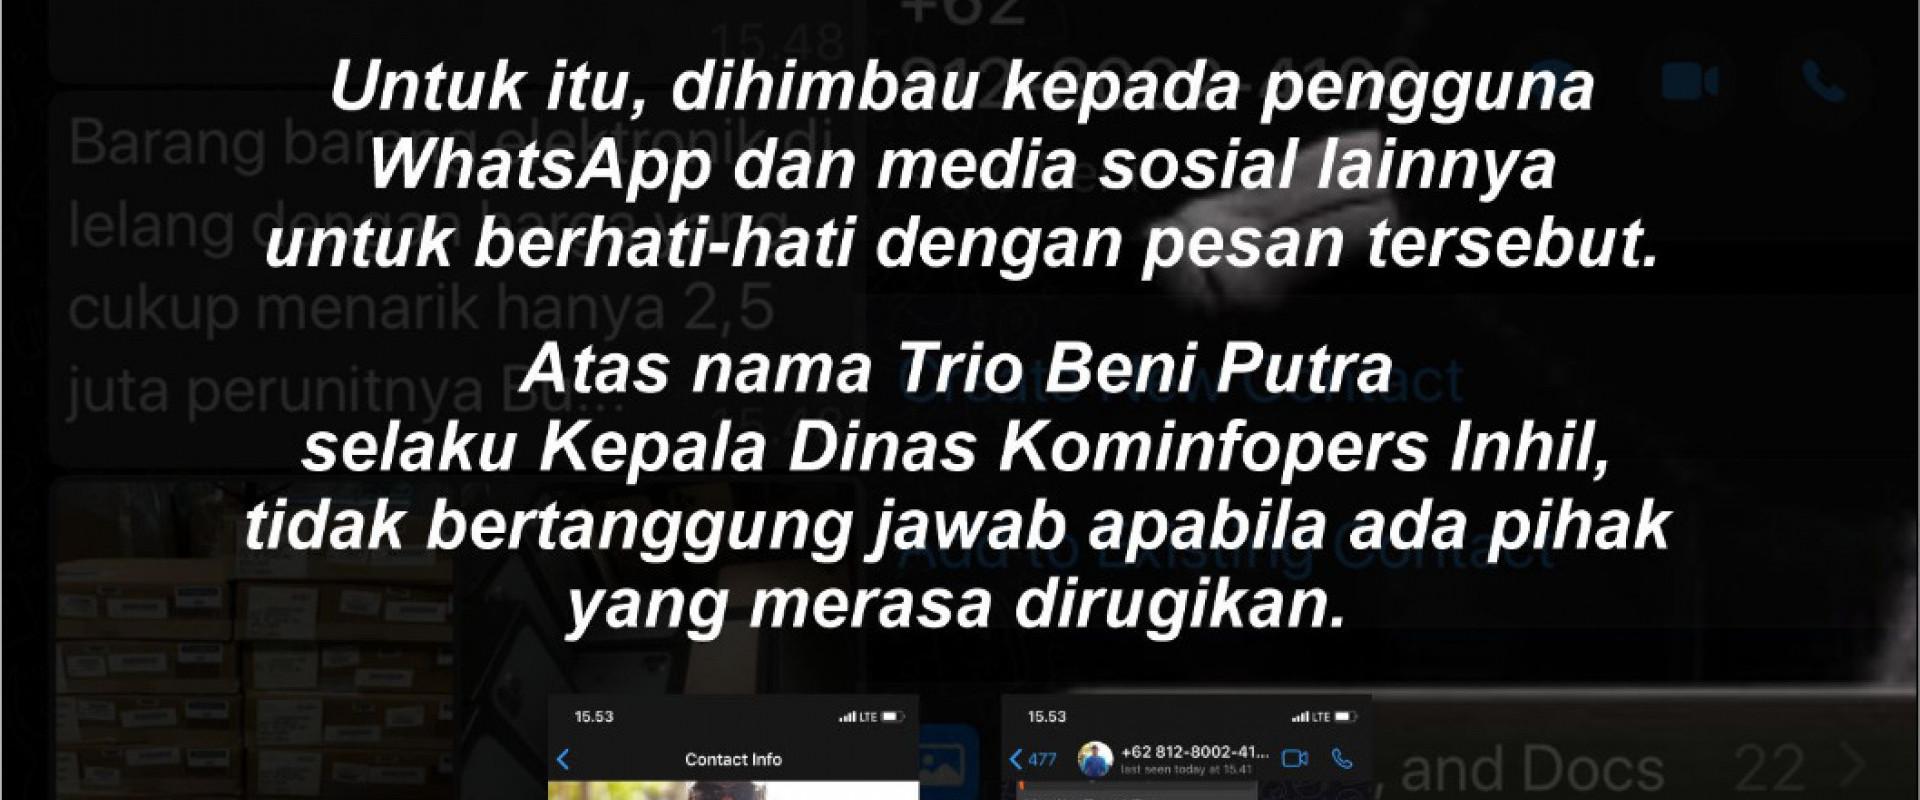 "Waspada penipuan"" ada nomor WhatsApp (WA) yang tak dikenal ngaku sebagai Kepala Diskominfopers Inhil Trio Beni Putra"